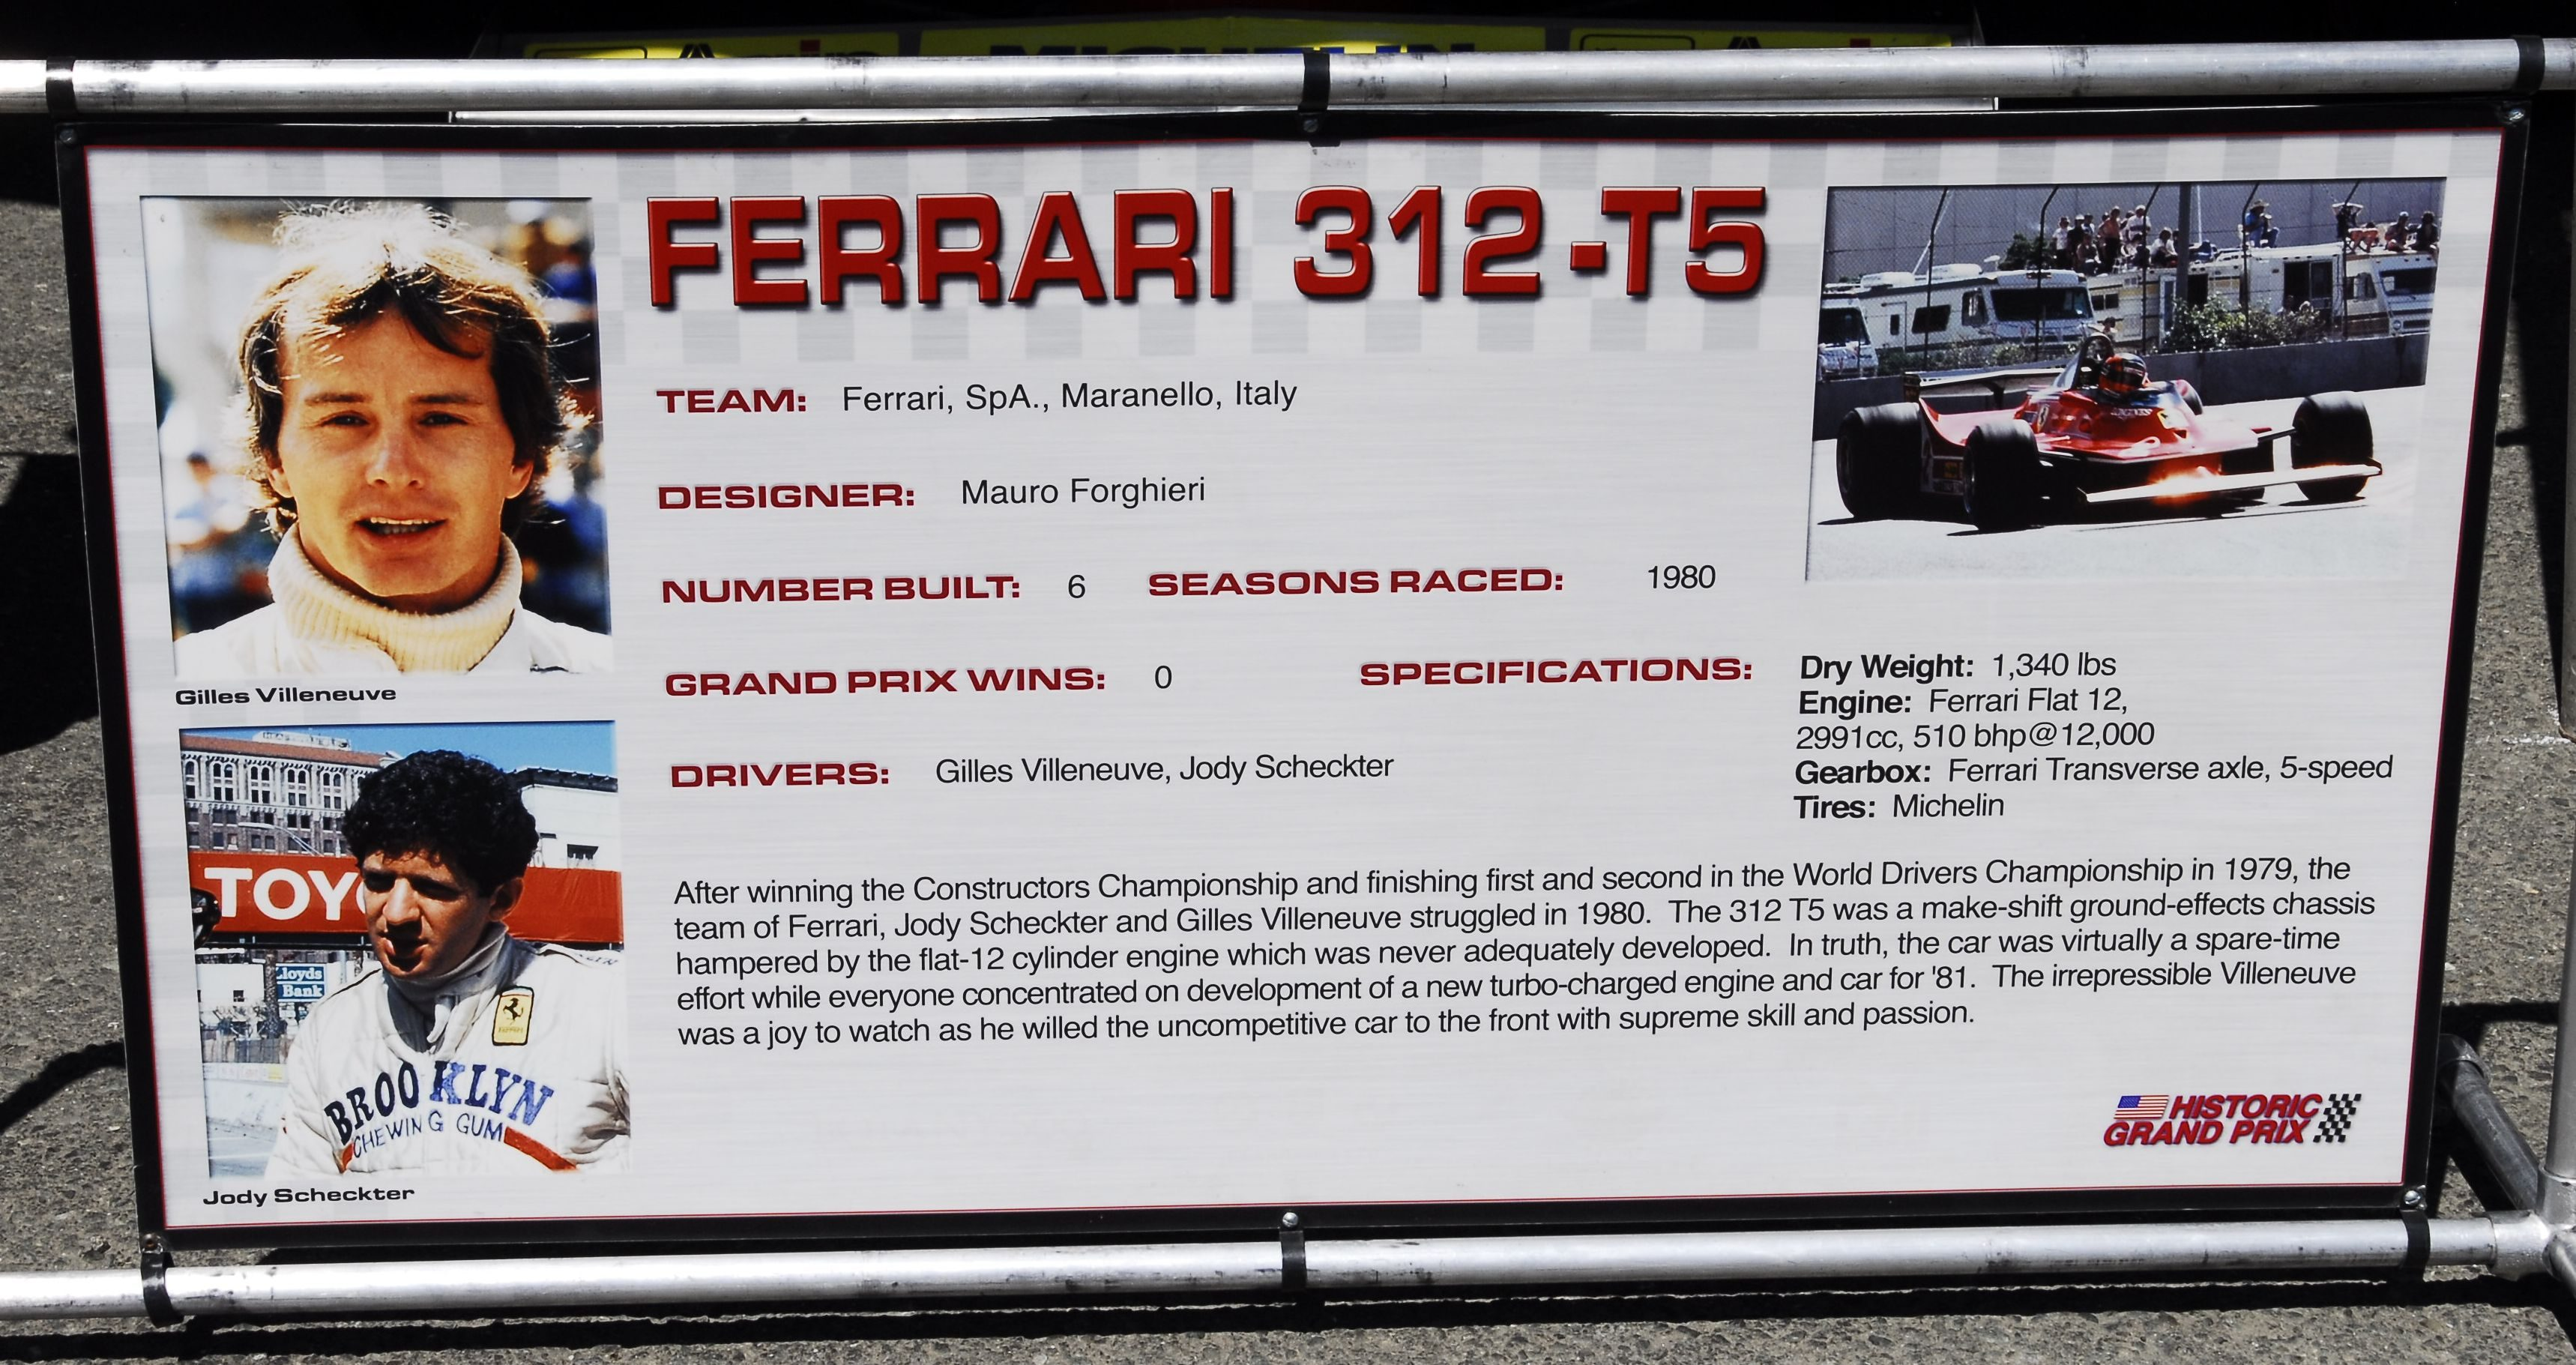 Ferrari_312-T5_1980_ICI0208.JPG